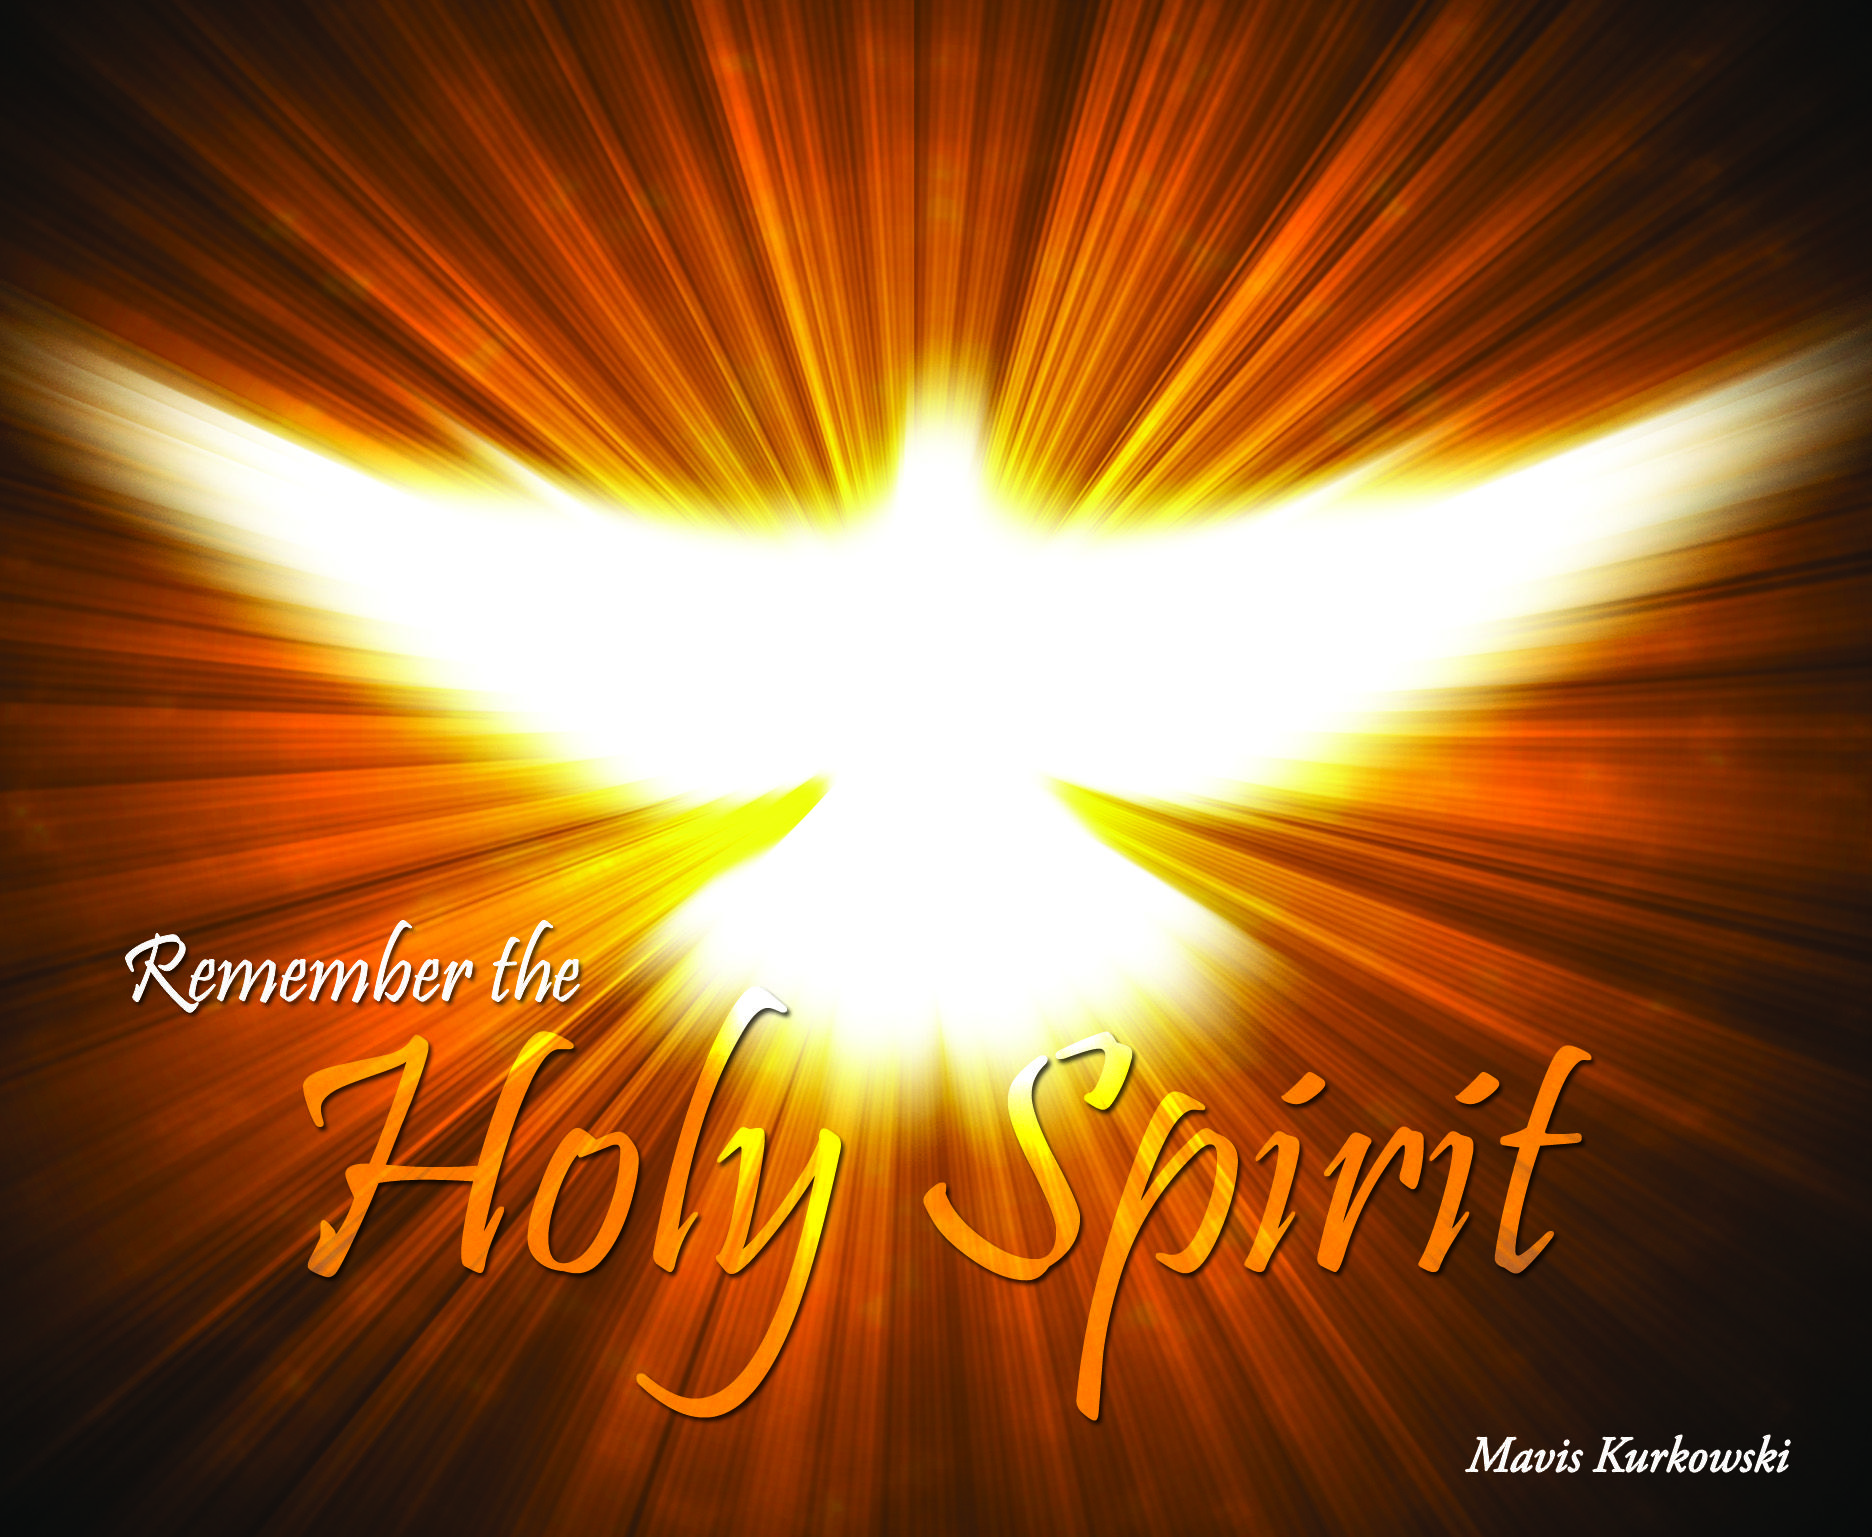 holy spirit Holy Spirit Dove Image The